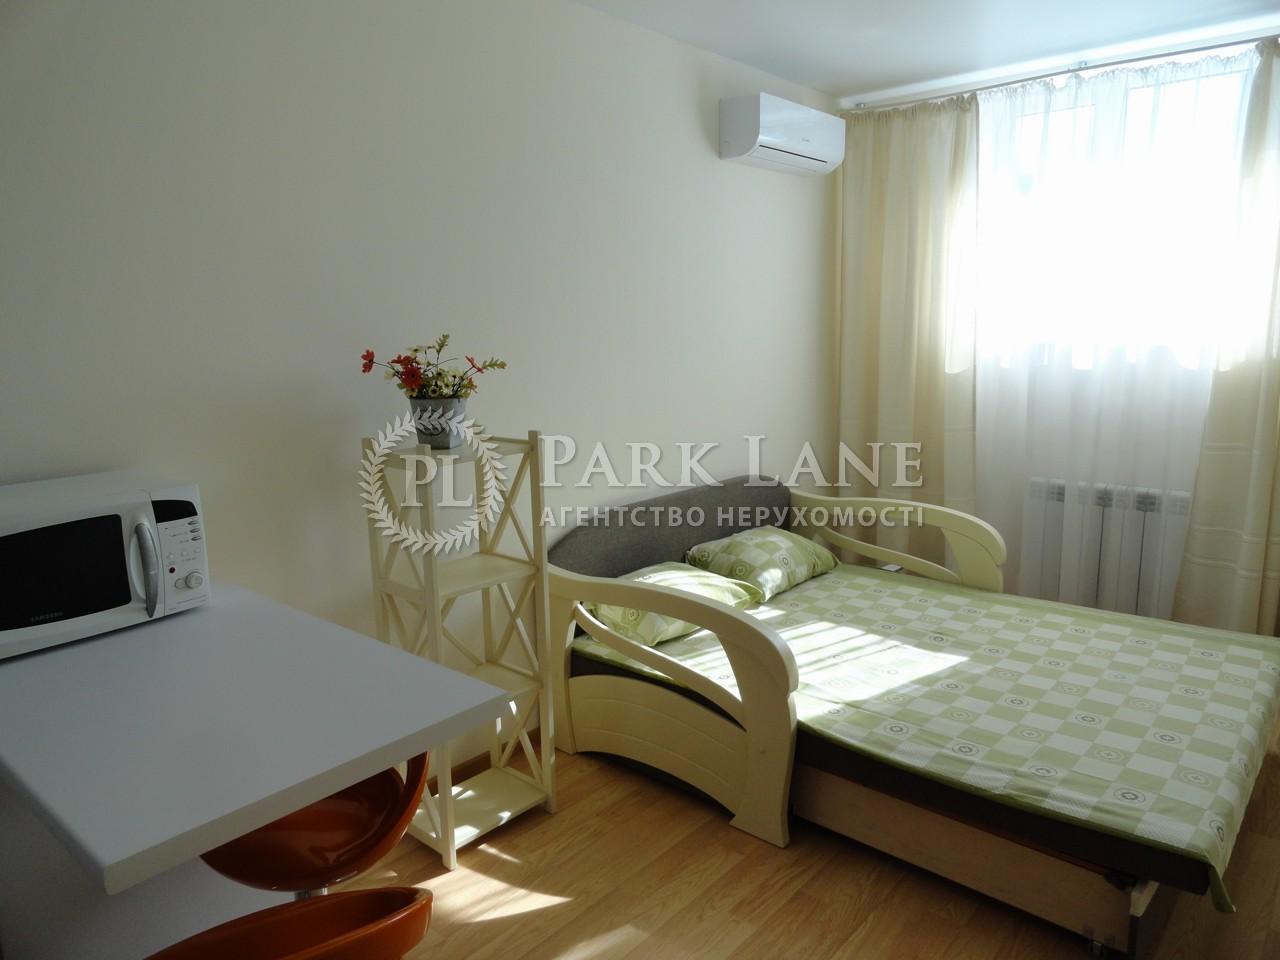 Квартира ул. Гонгадзе (Машиностроительная), 41, Киев, R-17712 - Фото 2